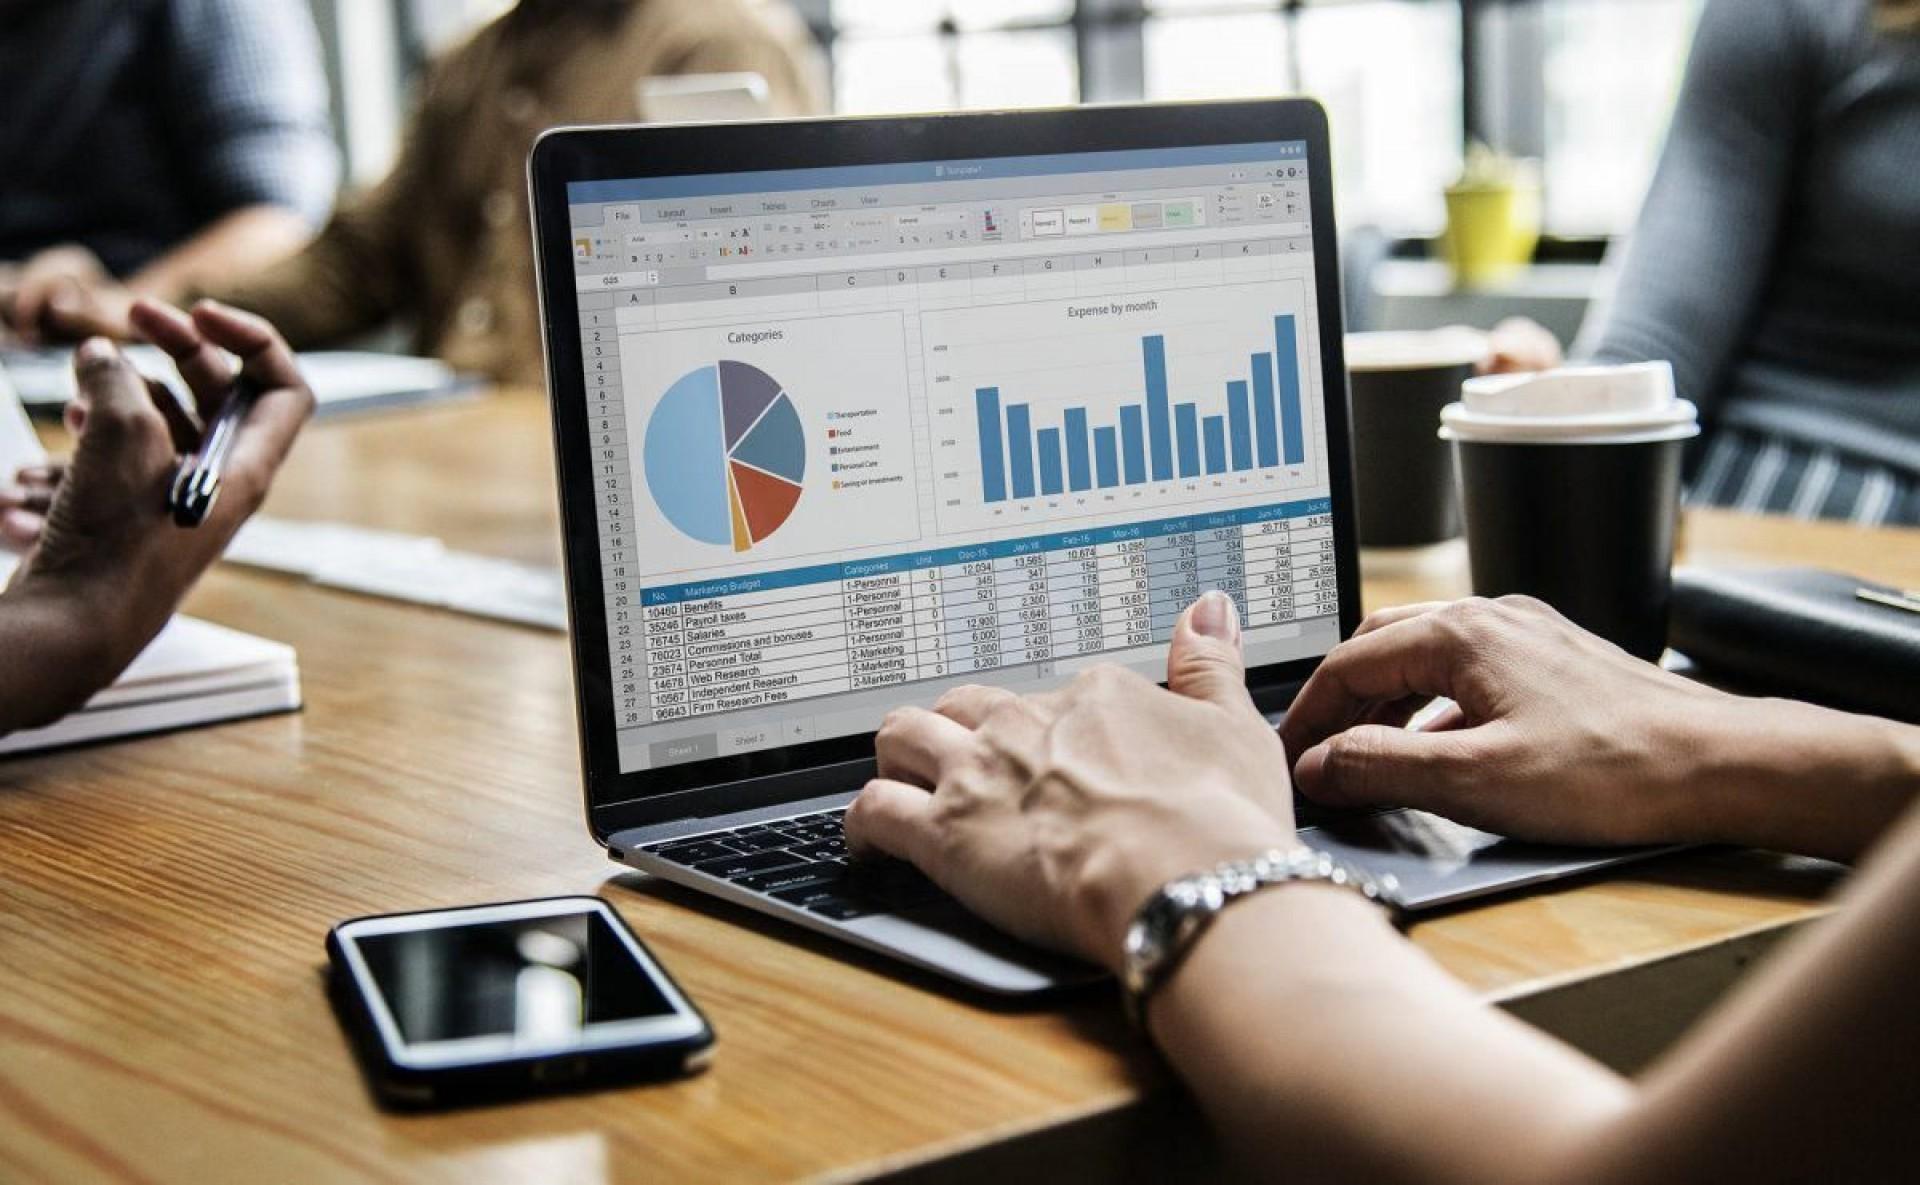 007 Stunning Score Deluxe Startup Busines Plan Template Highest Quality  Score-deluxe-startup-business-plan-template 1.docx1920